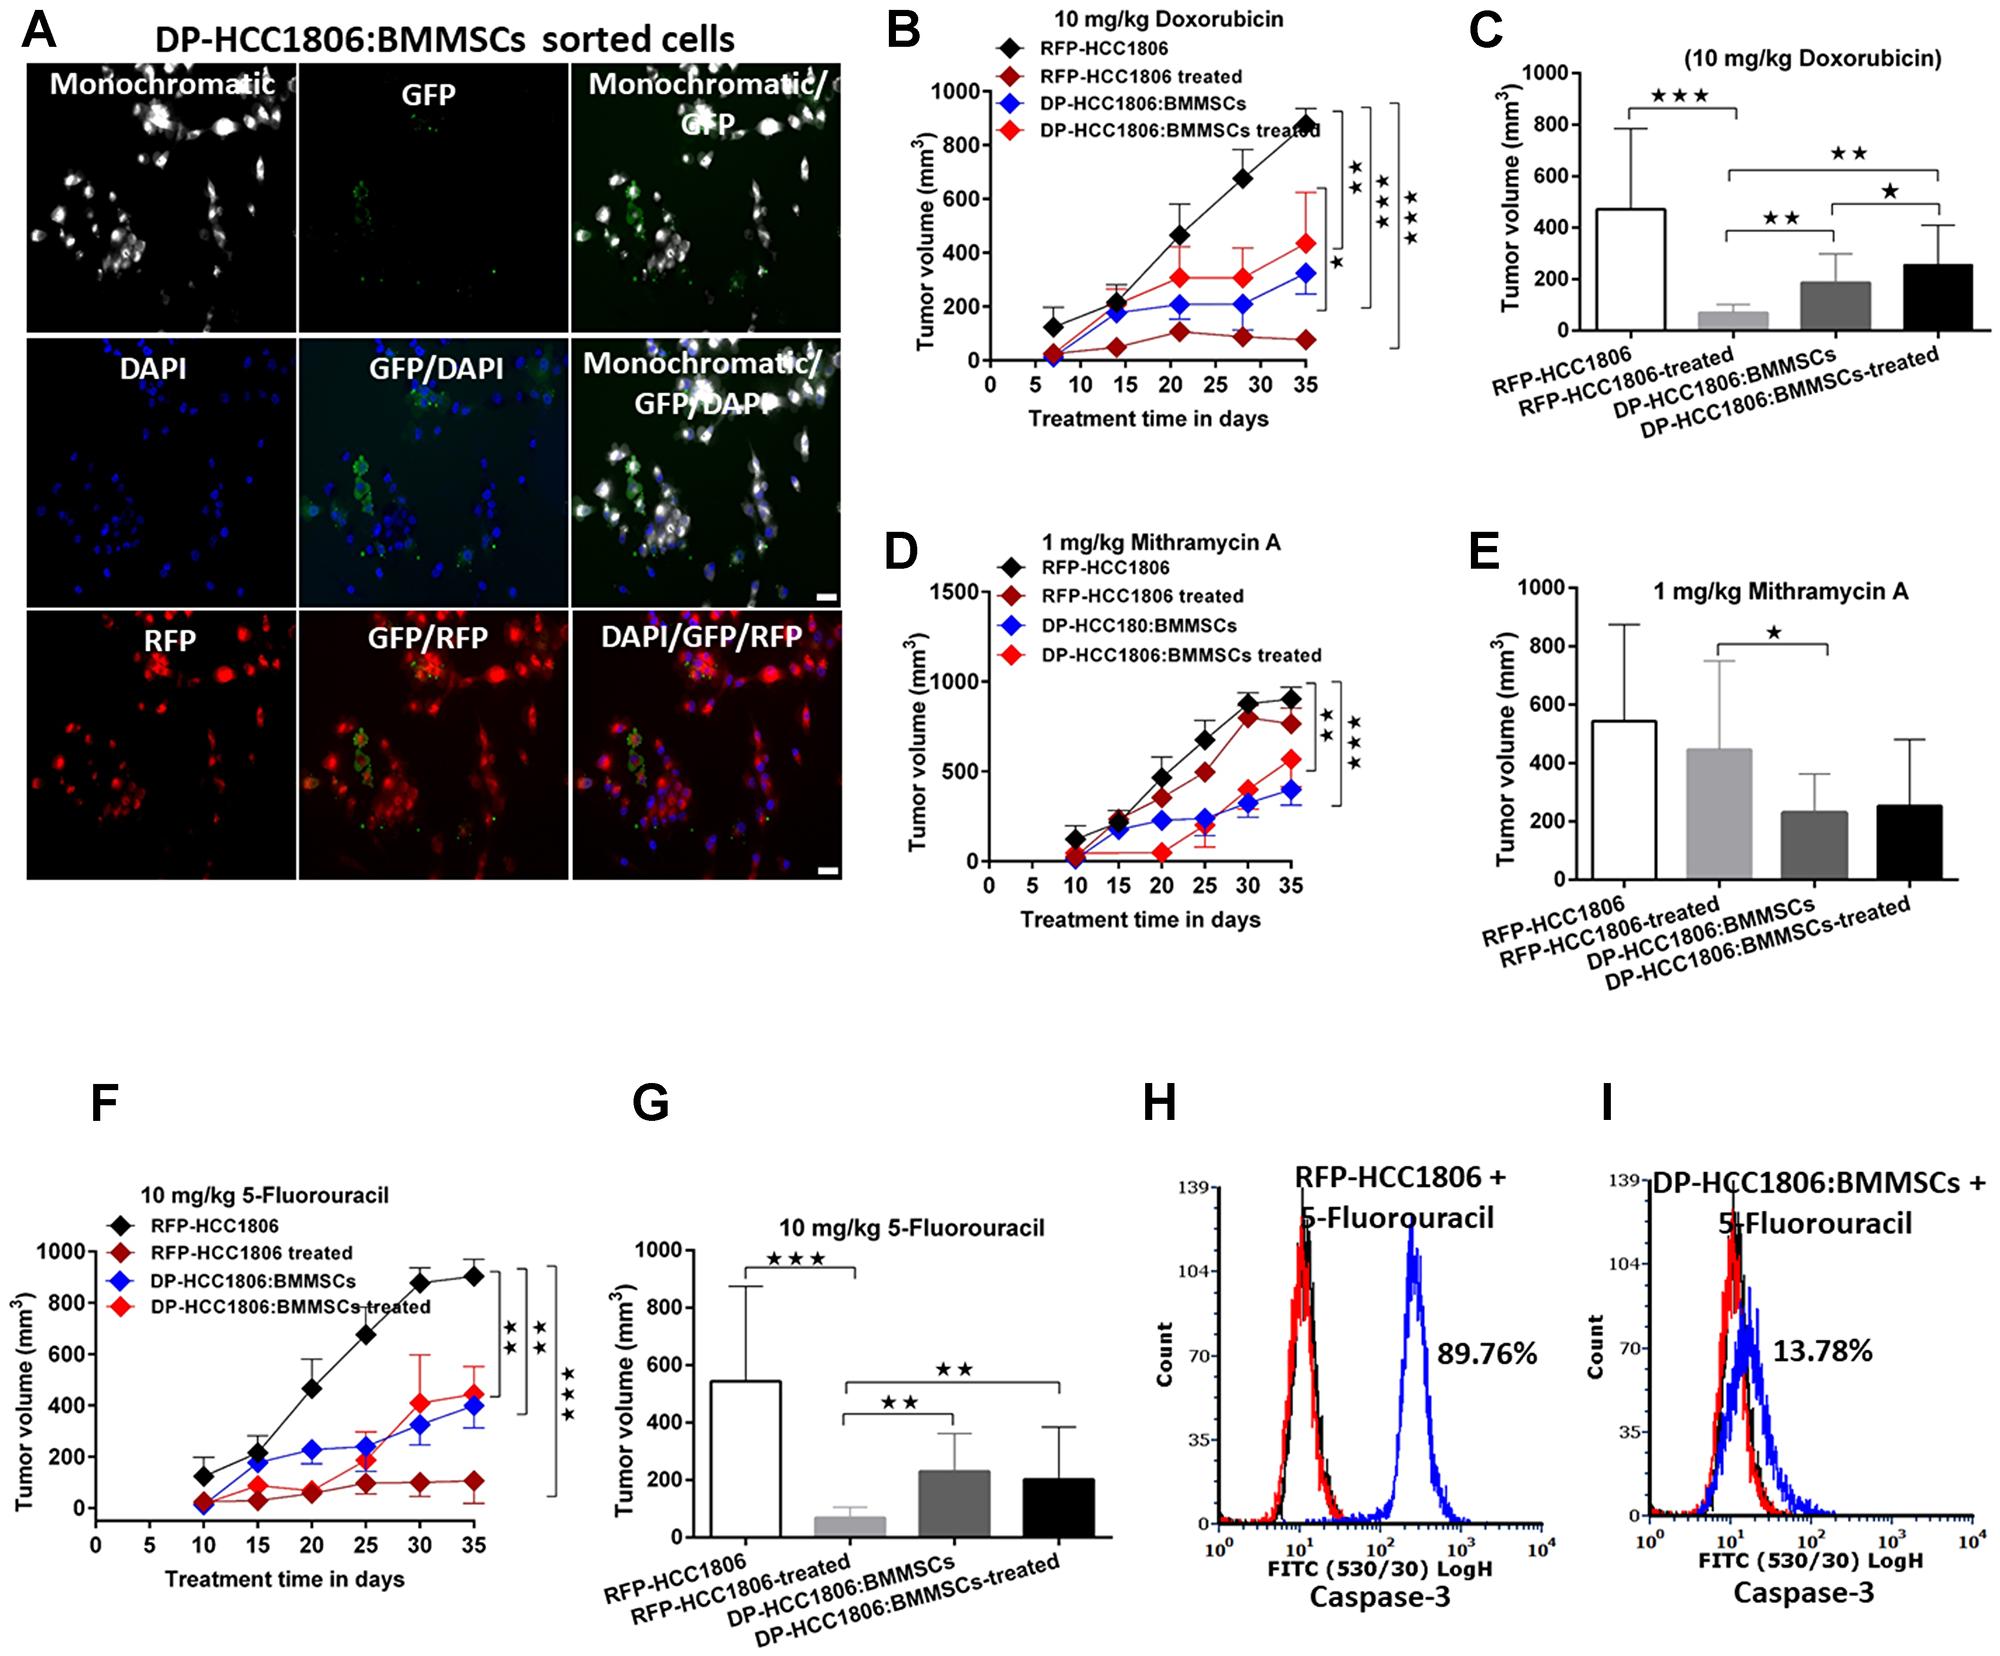 DP-HCC1806:BMMSC xenografts mediate chemotherapeutic resistance.